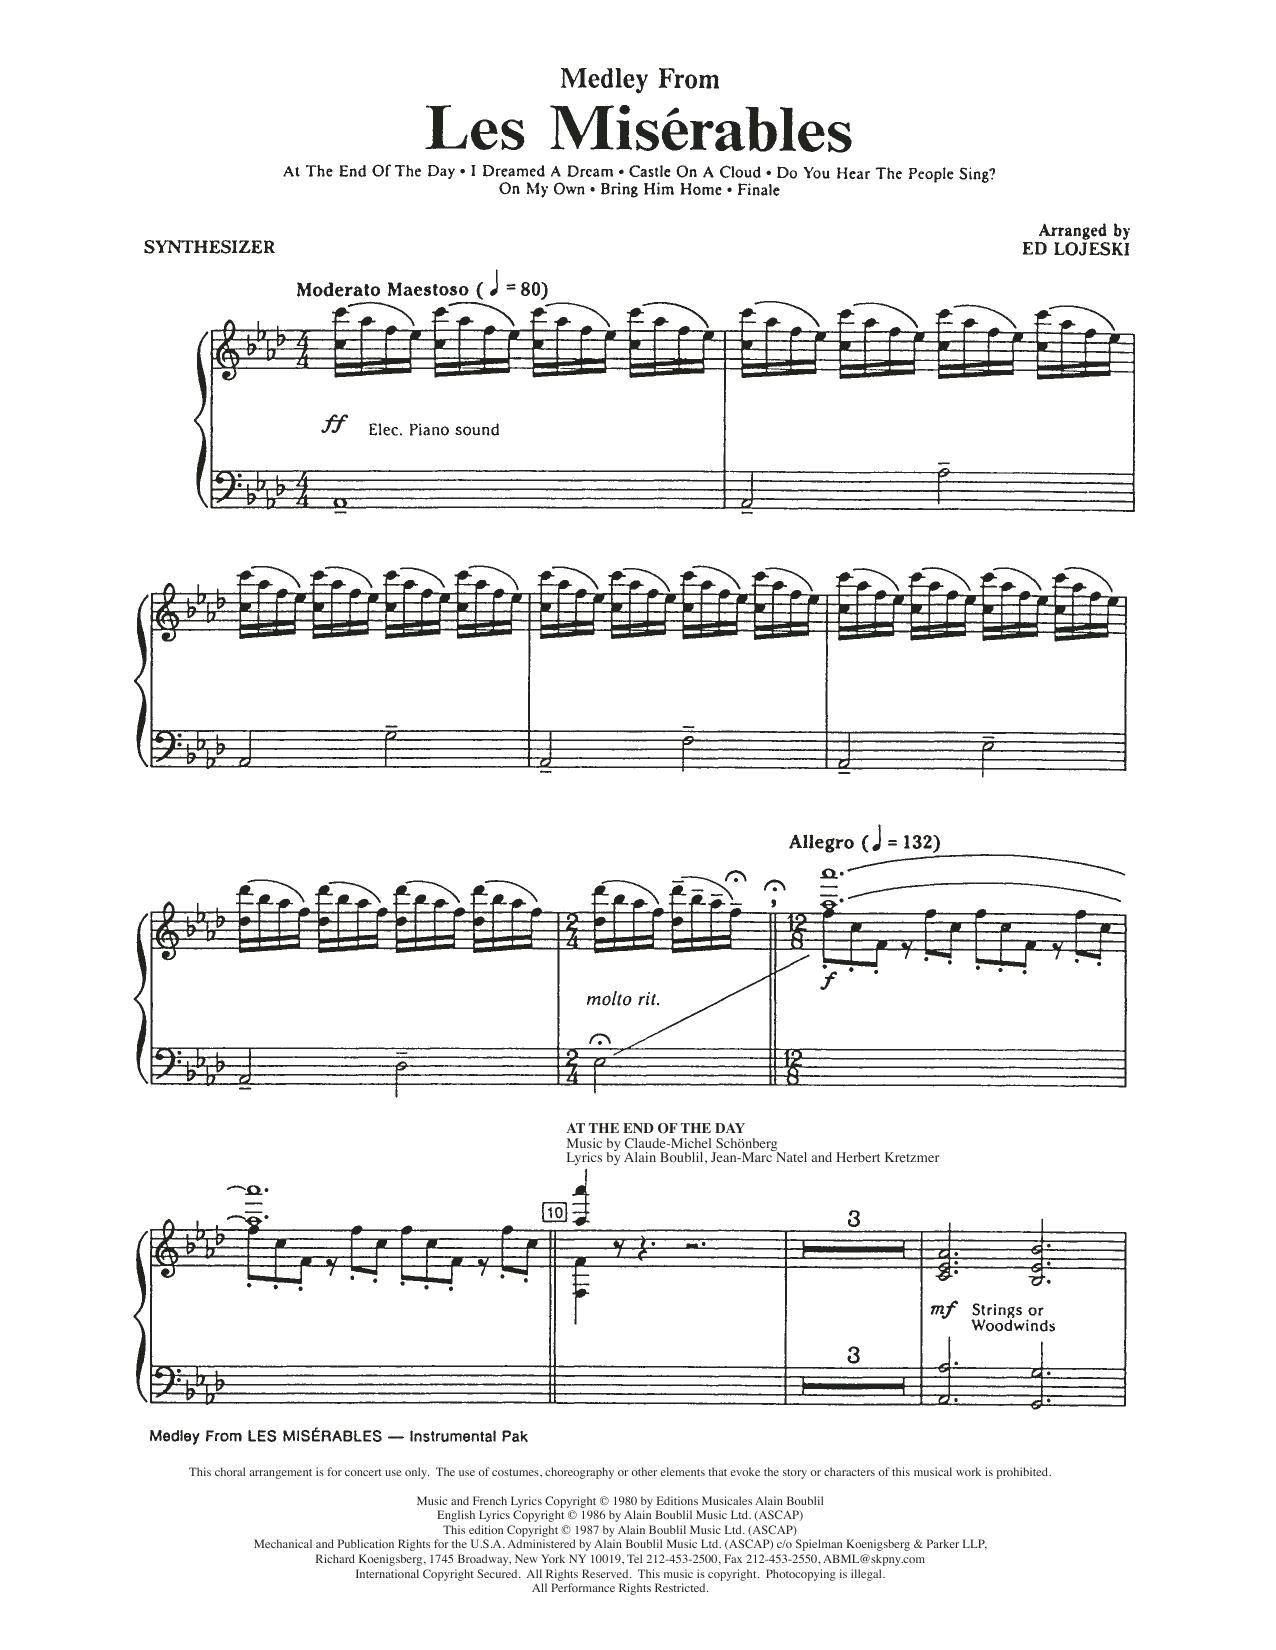 Boublil And Schonberg Les Miserables Choral Medley Arr Ed Lojeski Synthesizer Sheet Music Download Pdf Score 280742